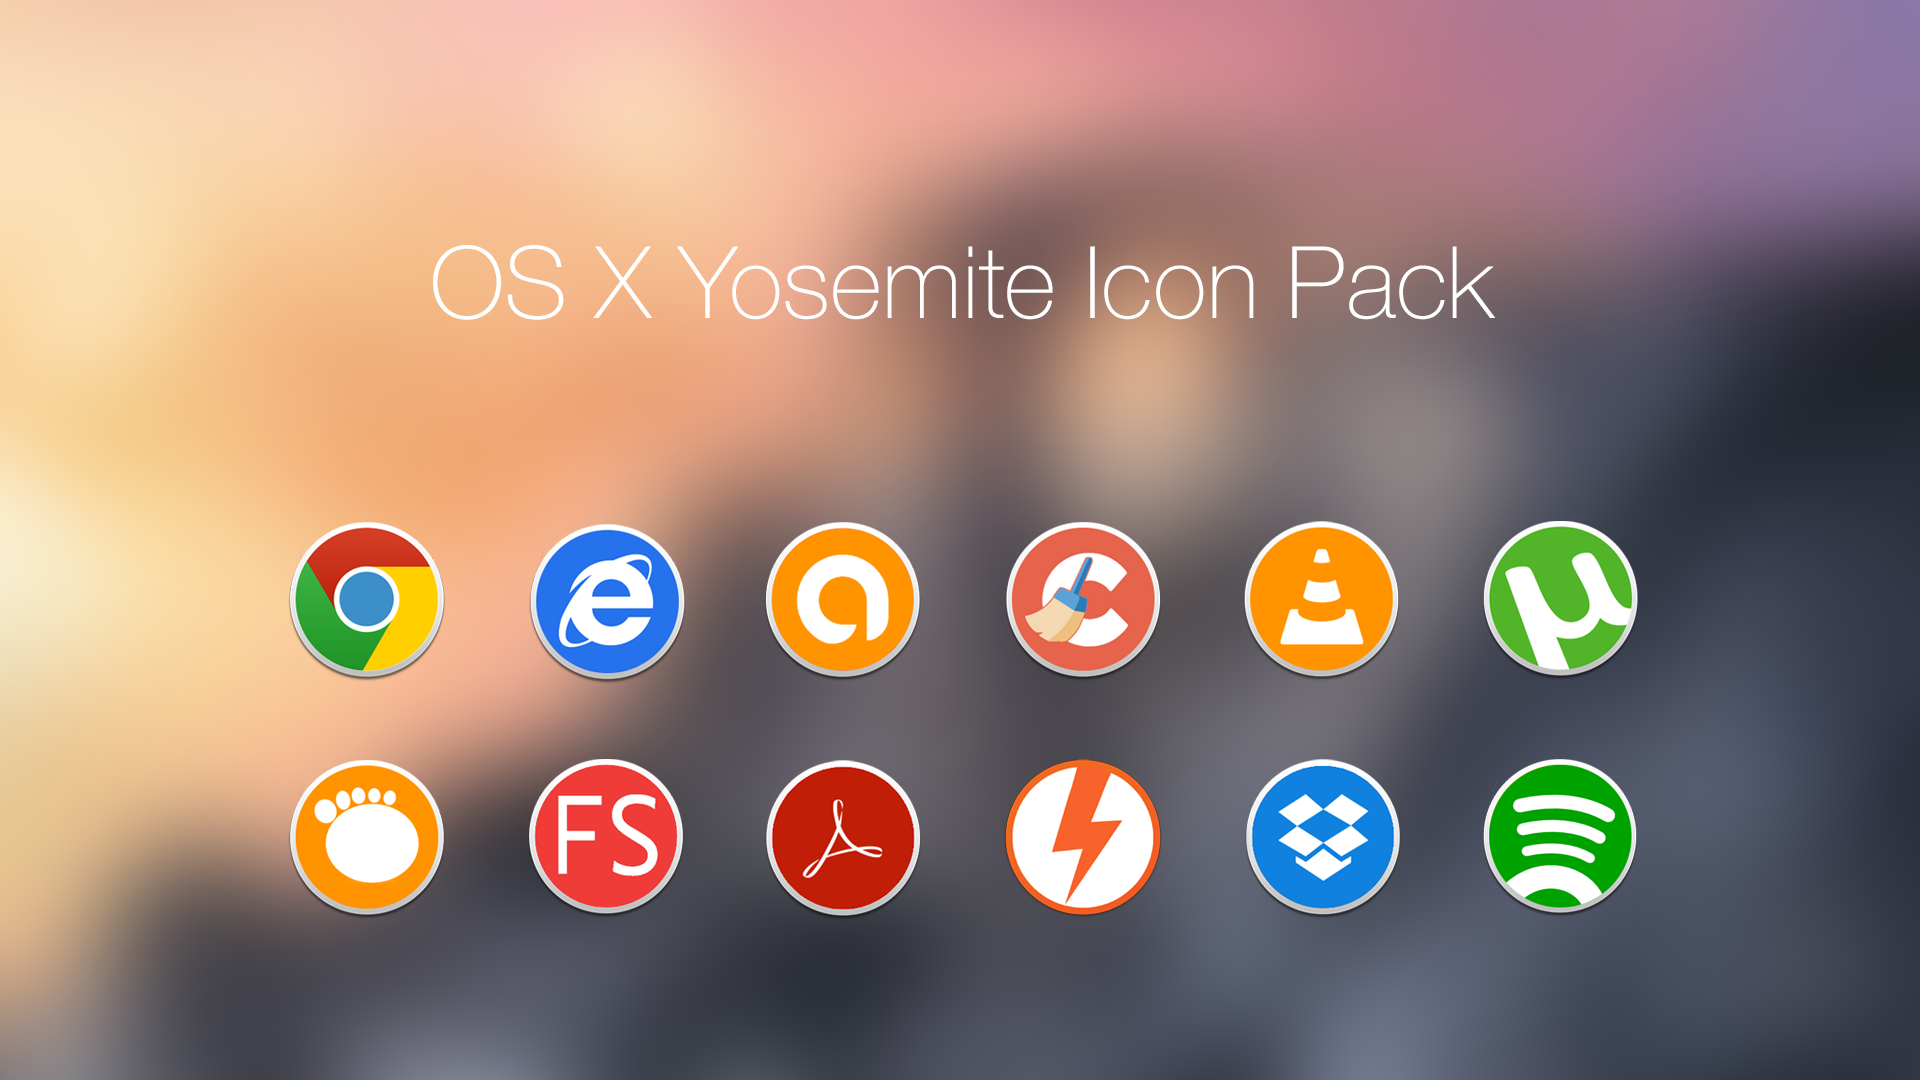 Adobe Photoshop Cs3 Os X Yosemite